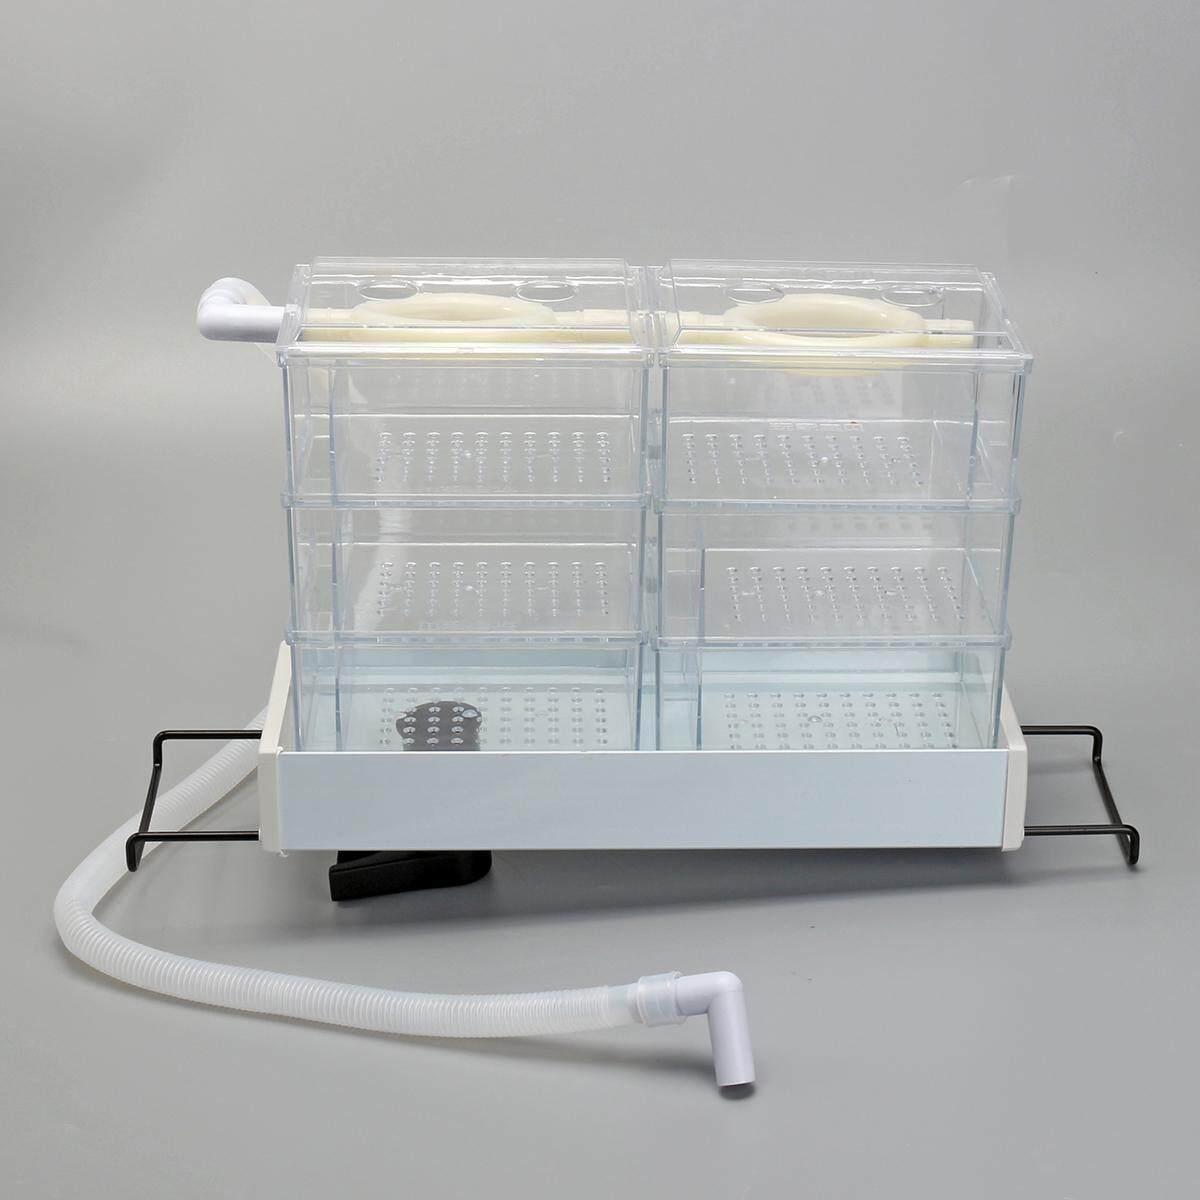 Aquarium Filter Trickle Rain Drop Upper Fish Tank Water Aqua Filter  6 Boxes By Glimmer.